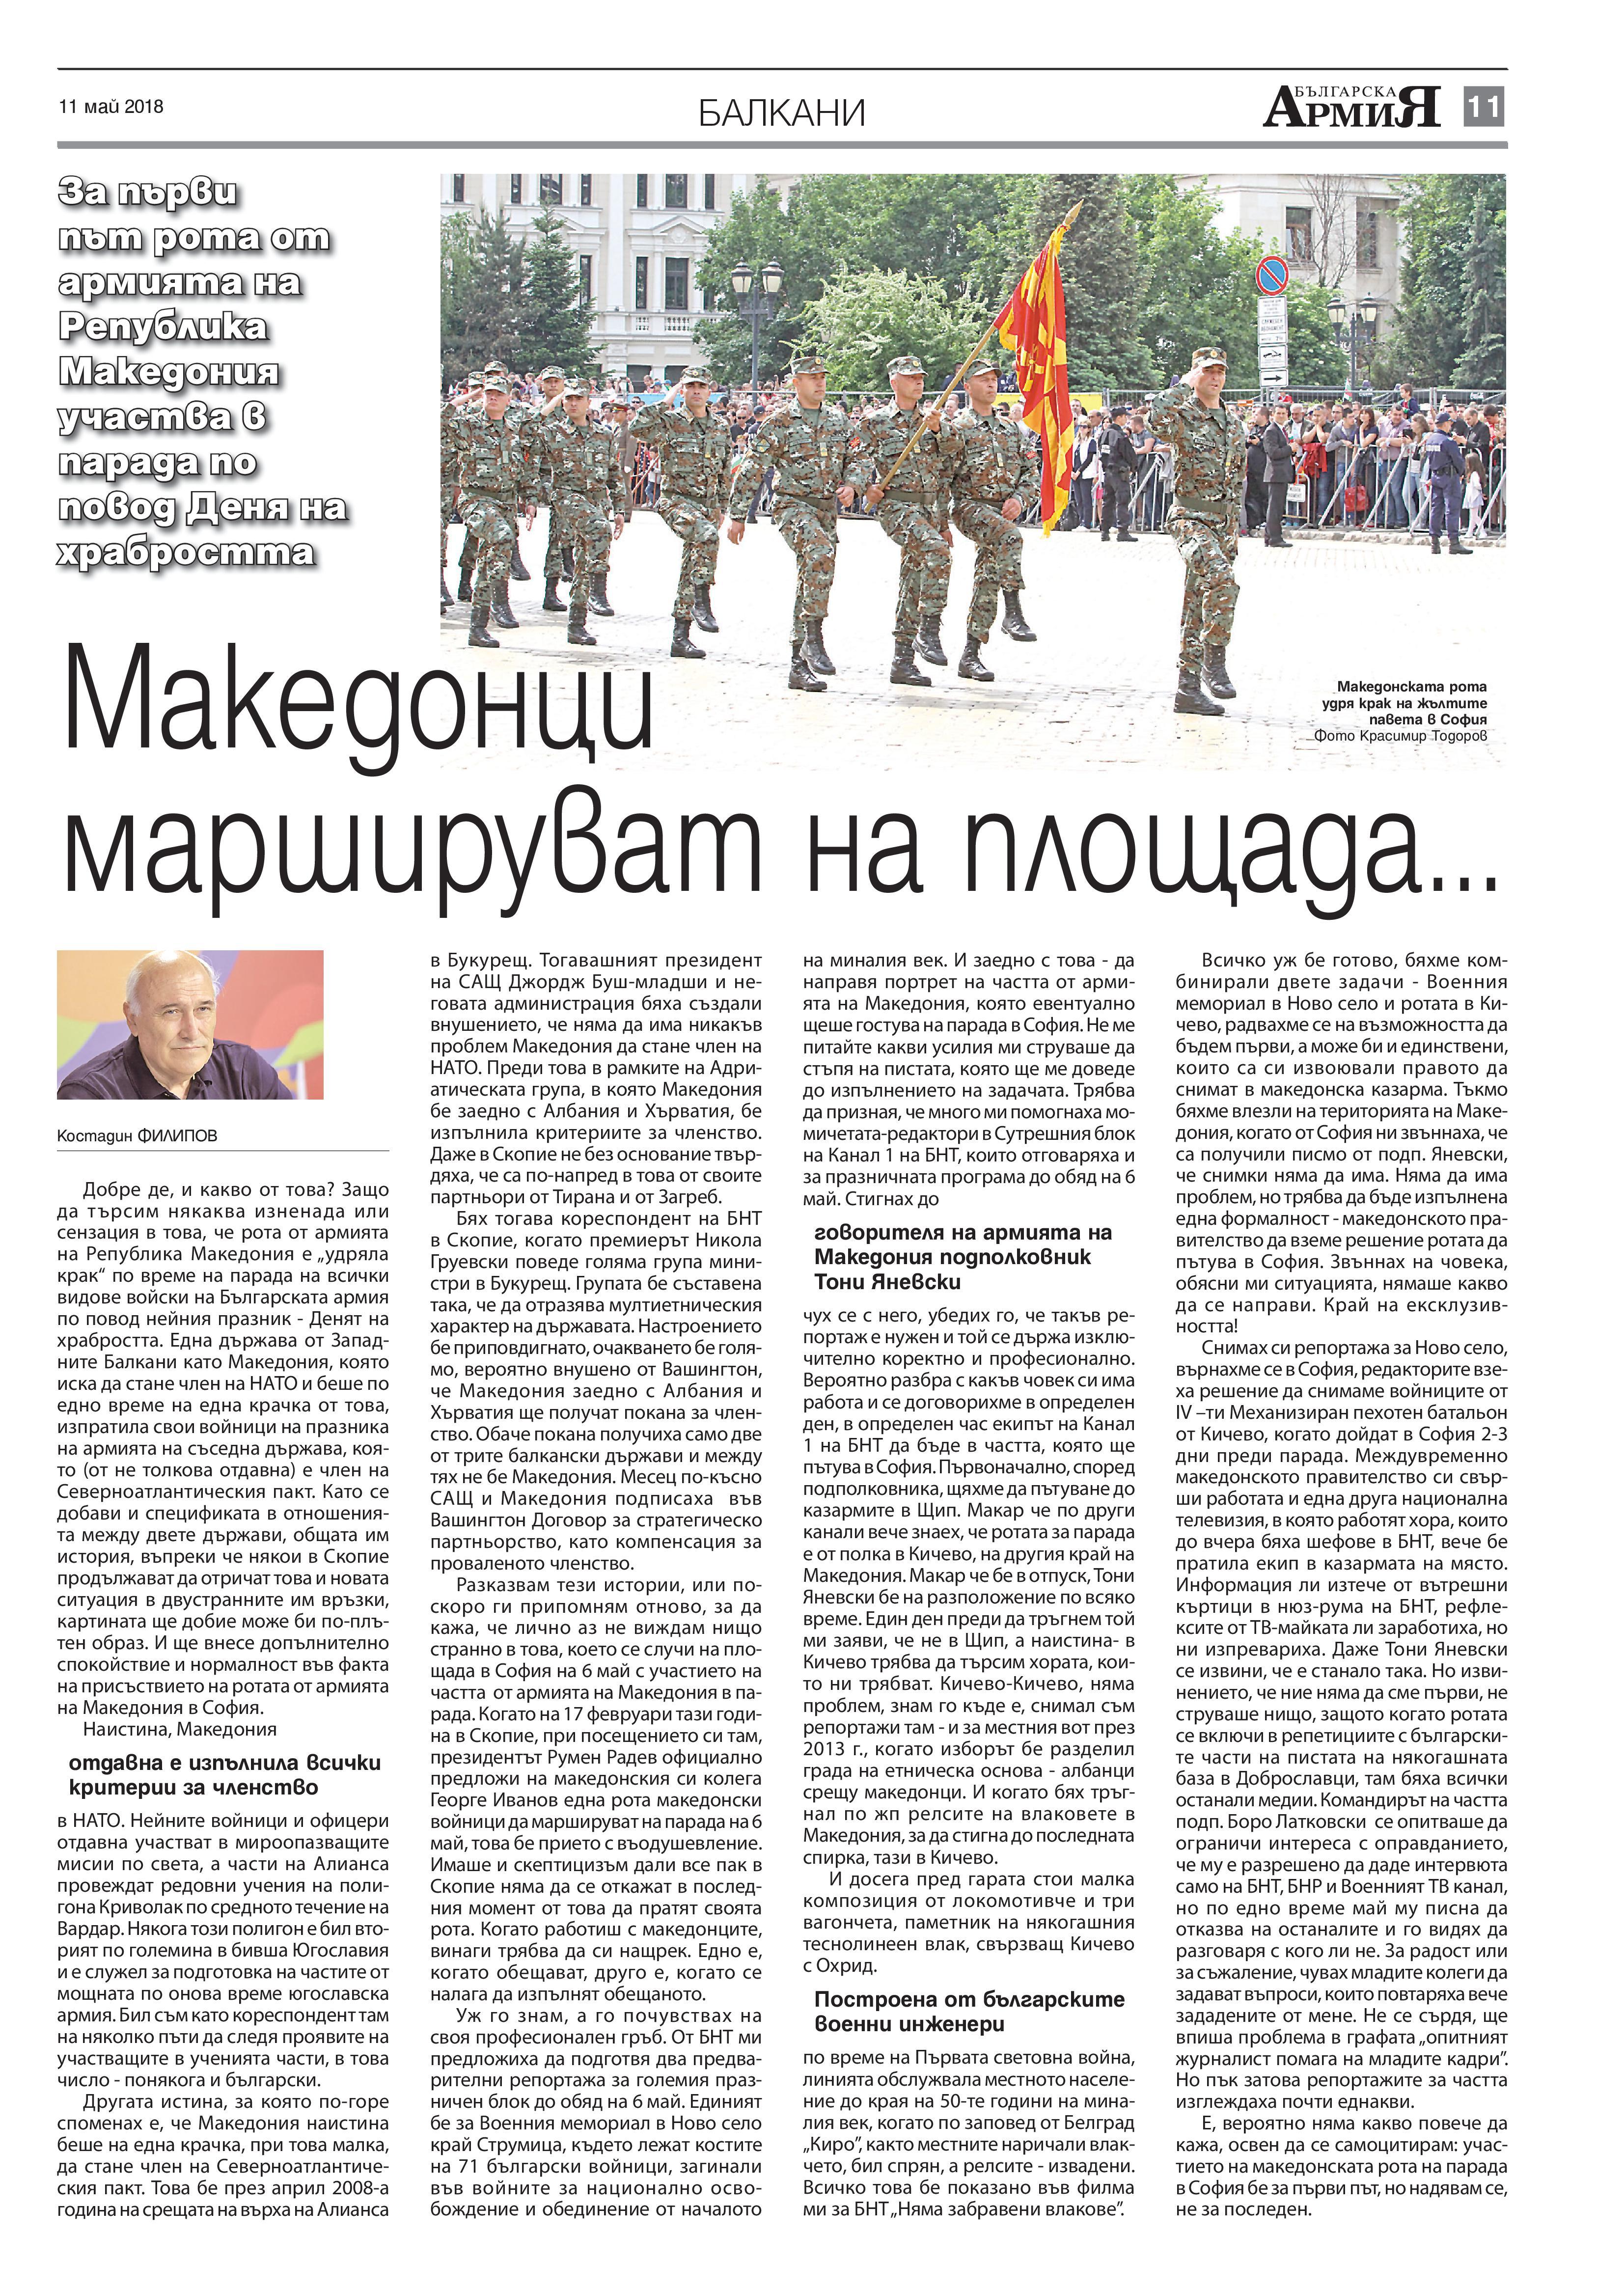 https://armymedia.bg/wp-content/uploads/2015/06/11-21.jpg